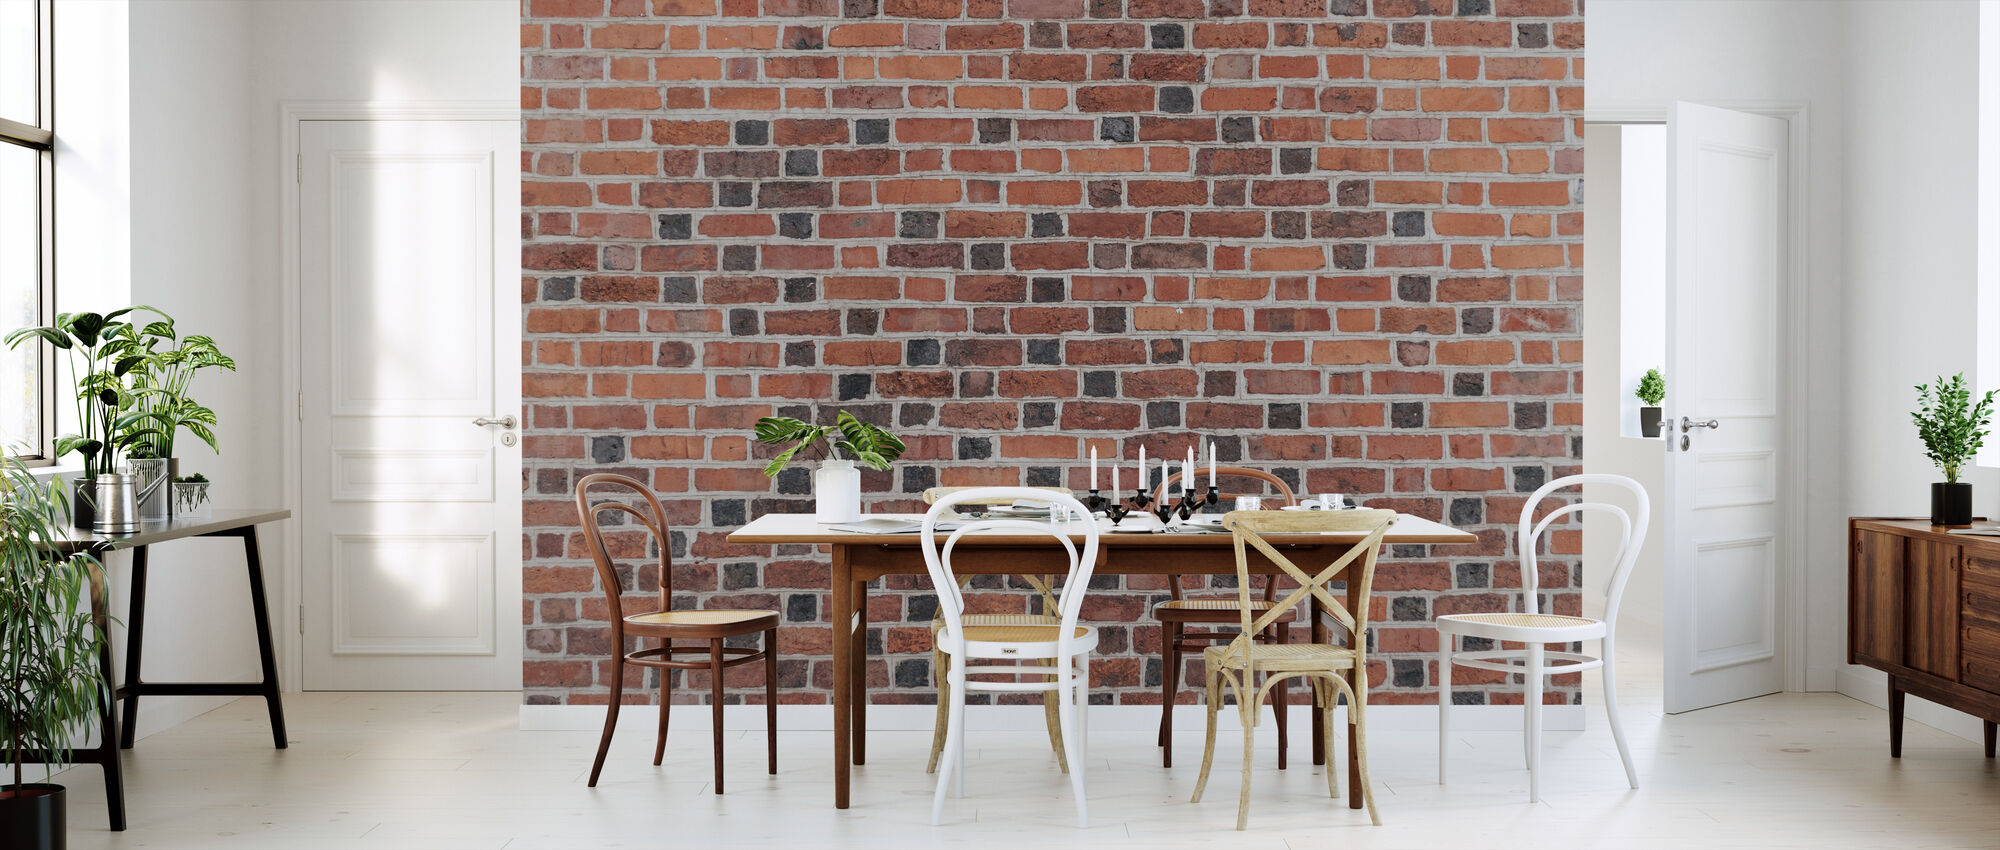 Brick Wall Brown - Wallpaper - Kitchen